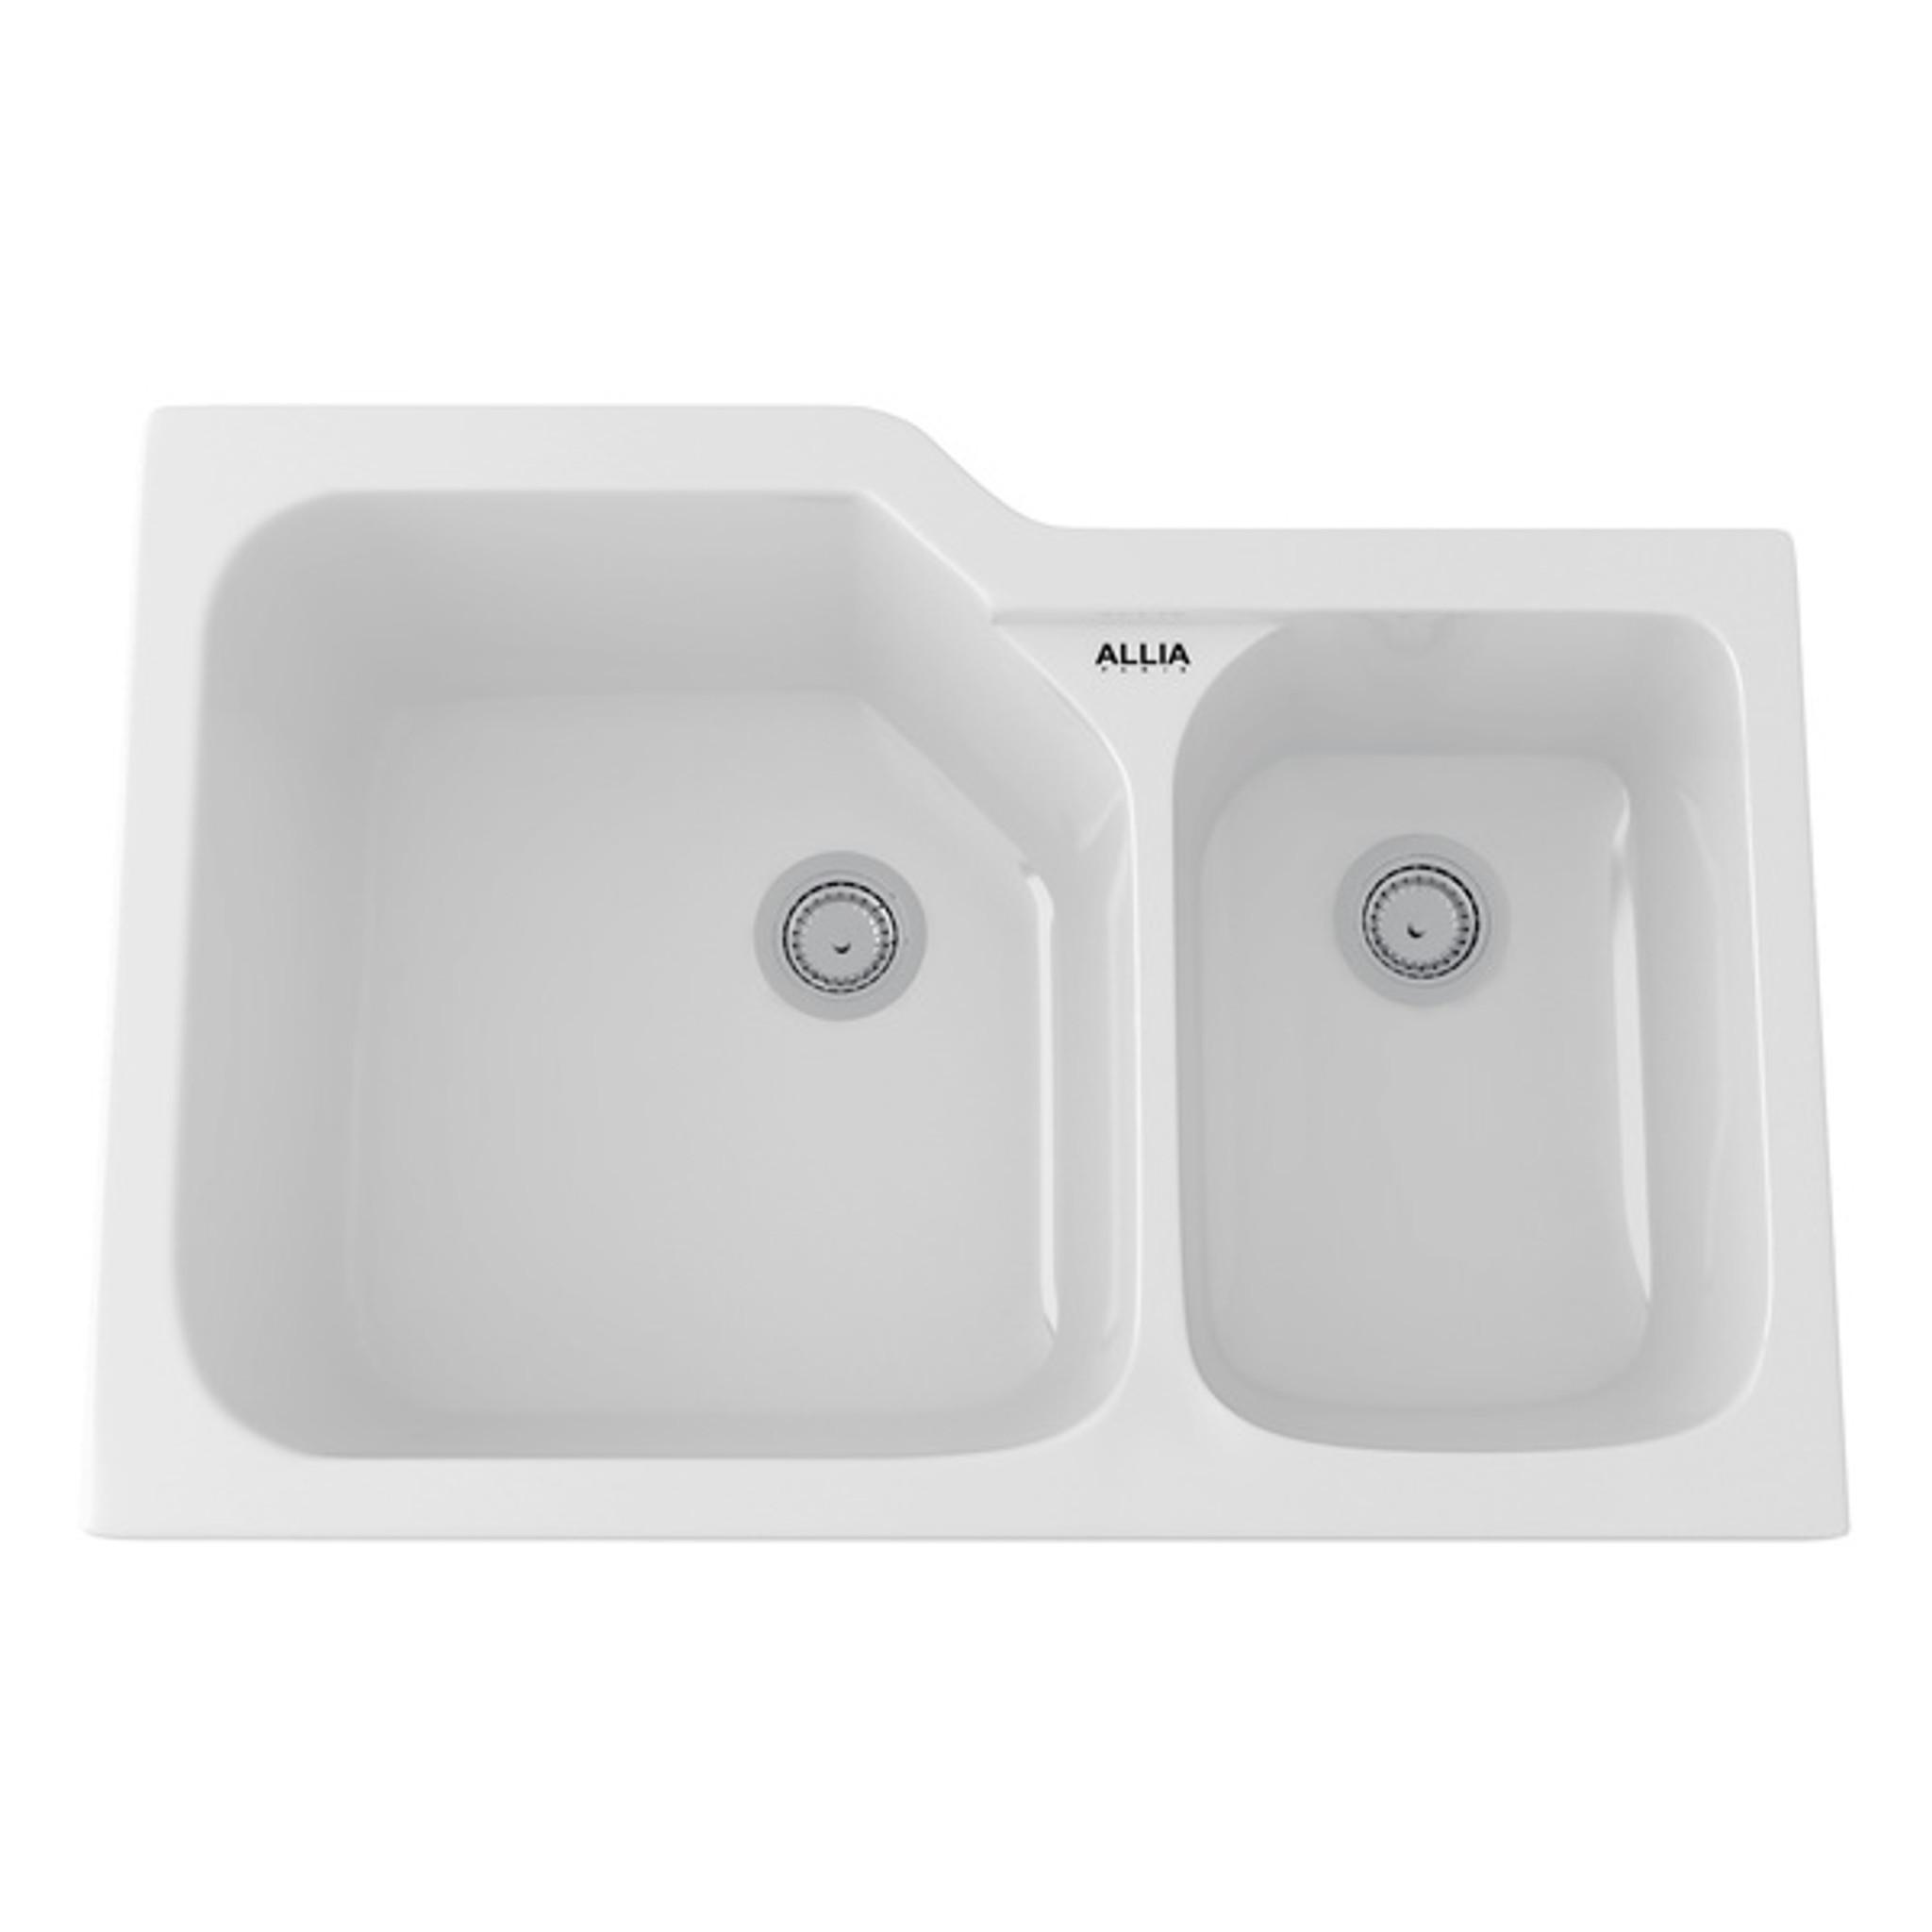 Rohl 6337 00 Allia Fireclay 2 Bowl Undermount Kitchen Sink White